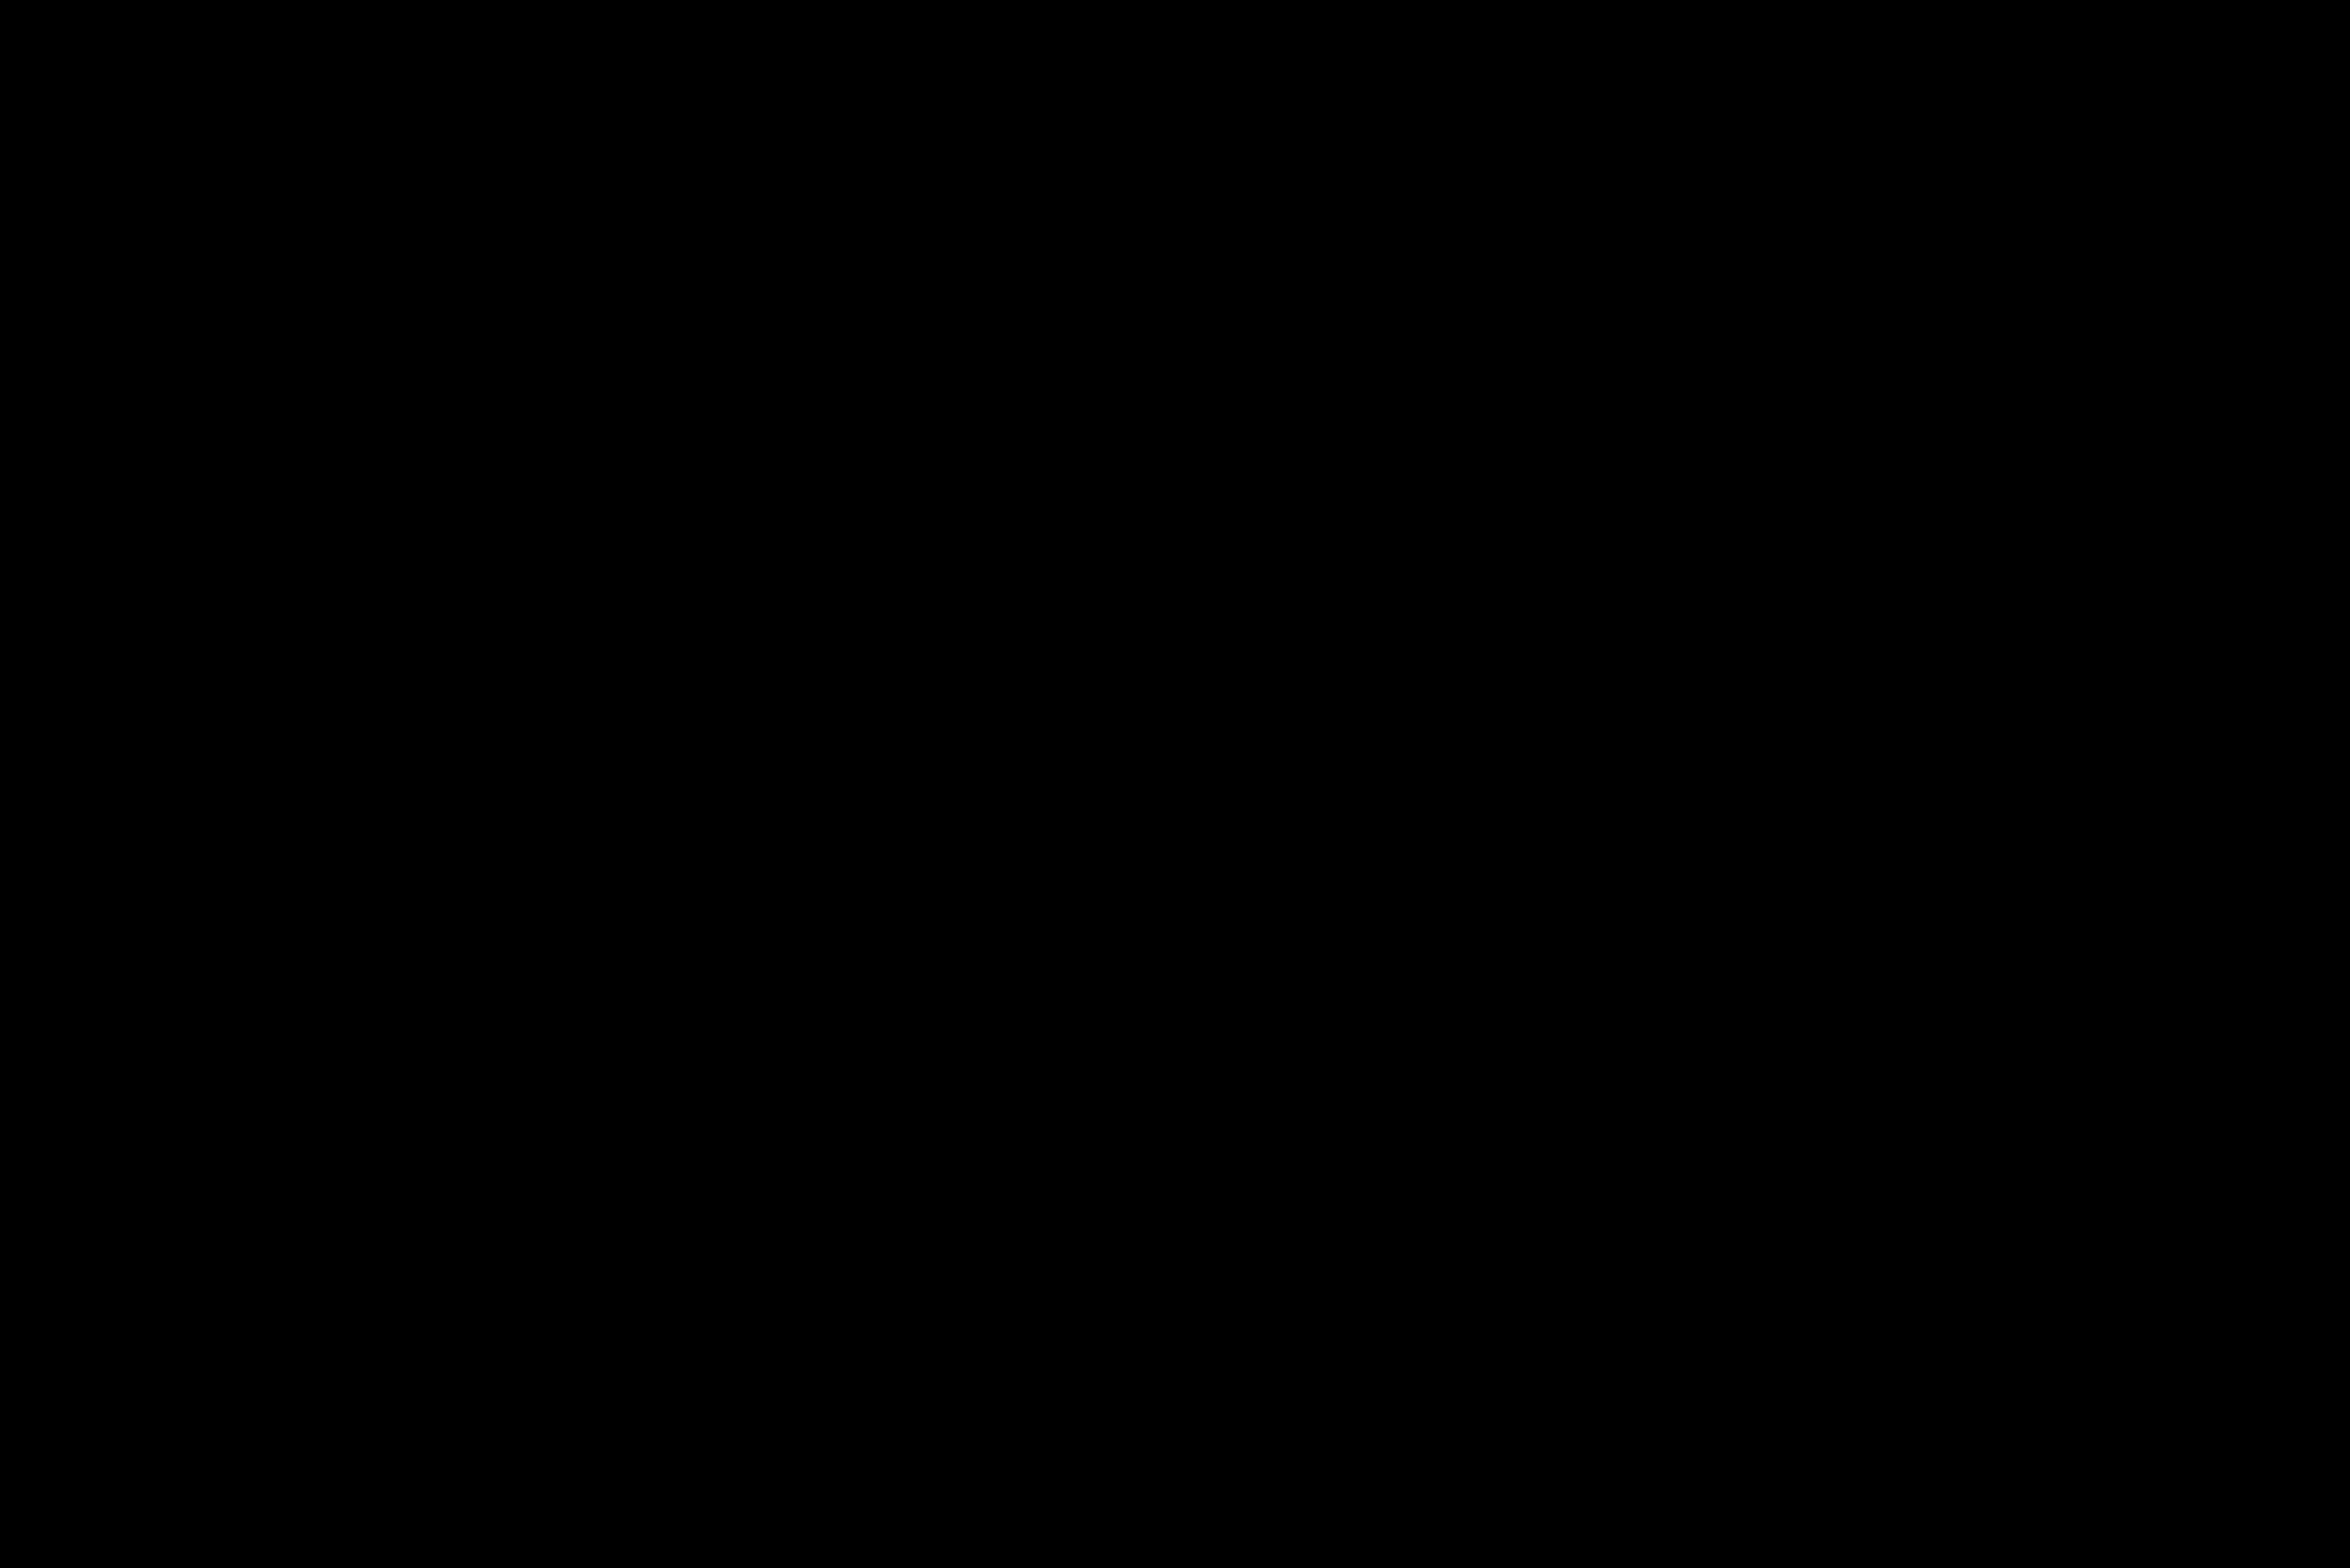 JUNIOREN SEGEL-LIGA / Act 3 Berlin